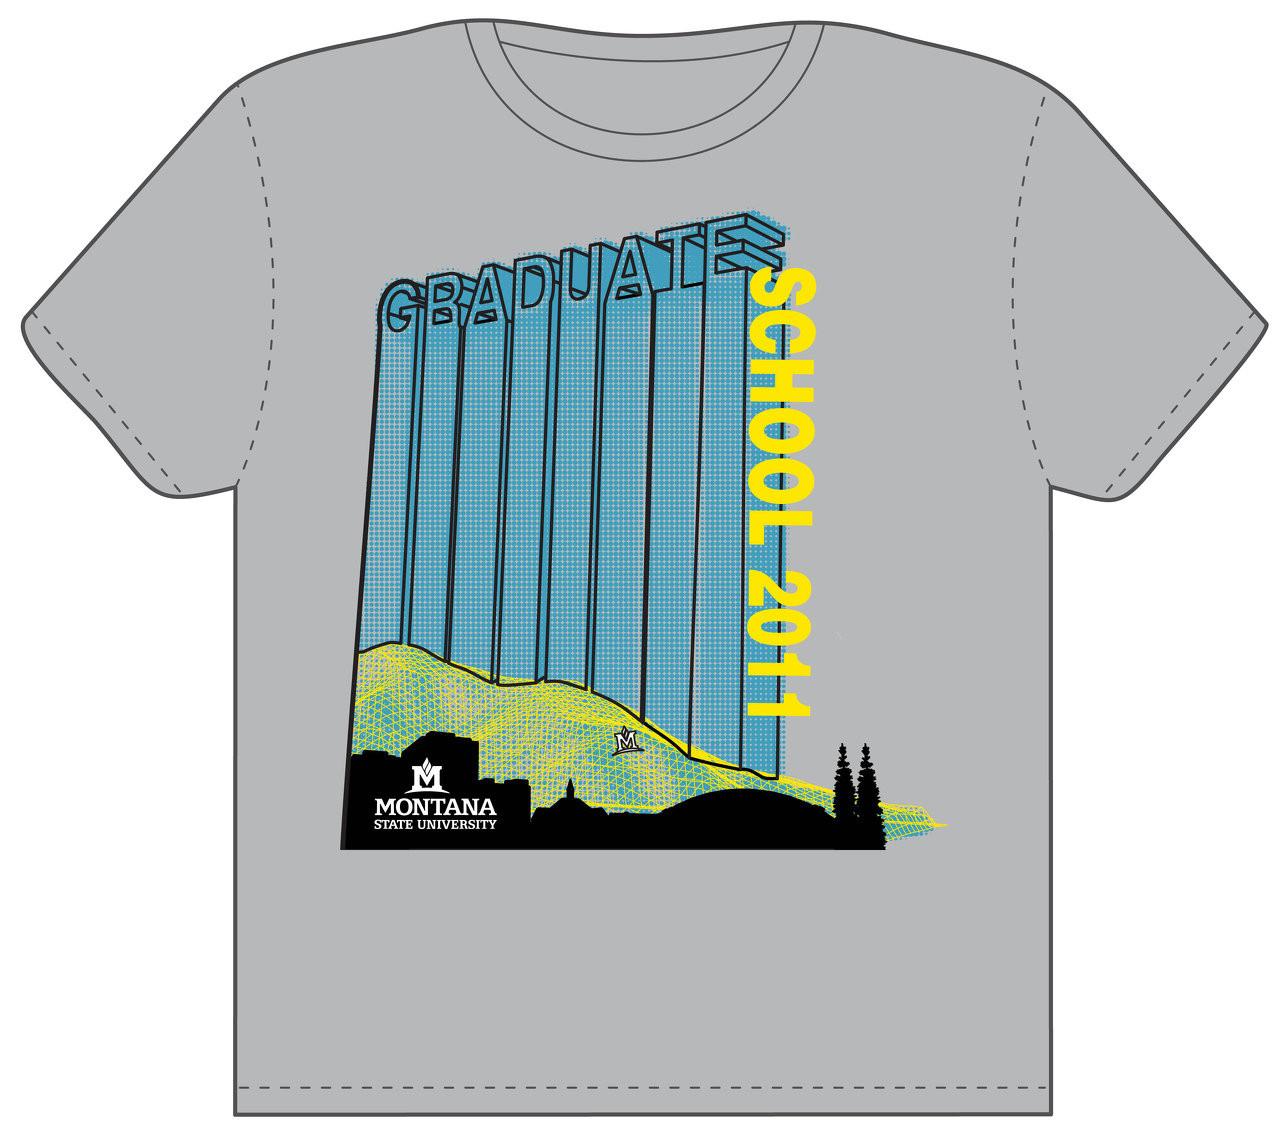 Graduate School T-shirt Design Competition